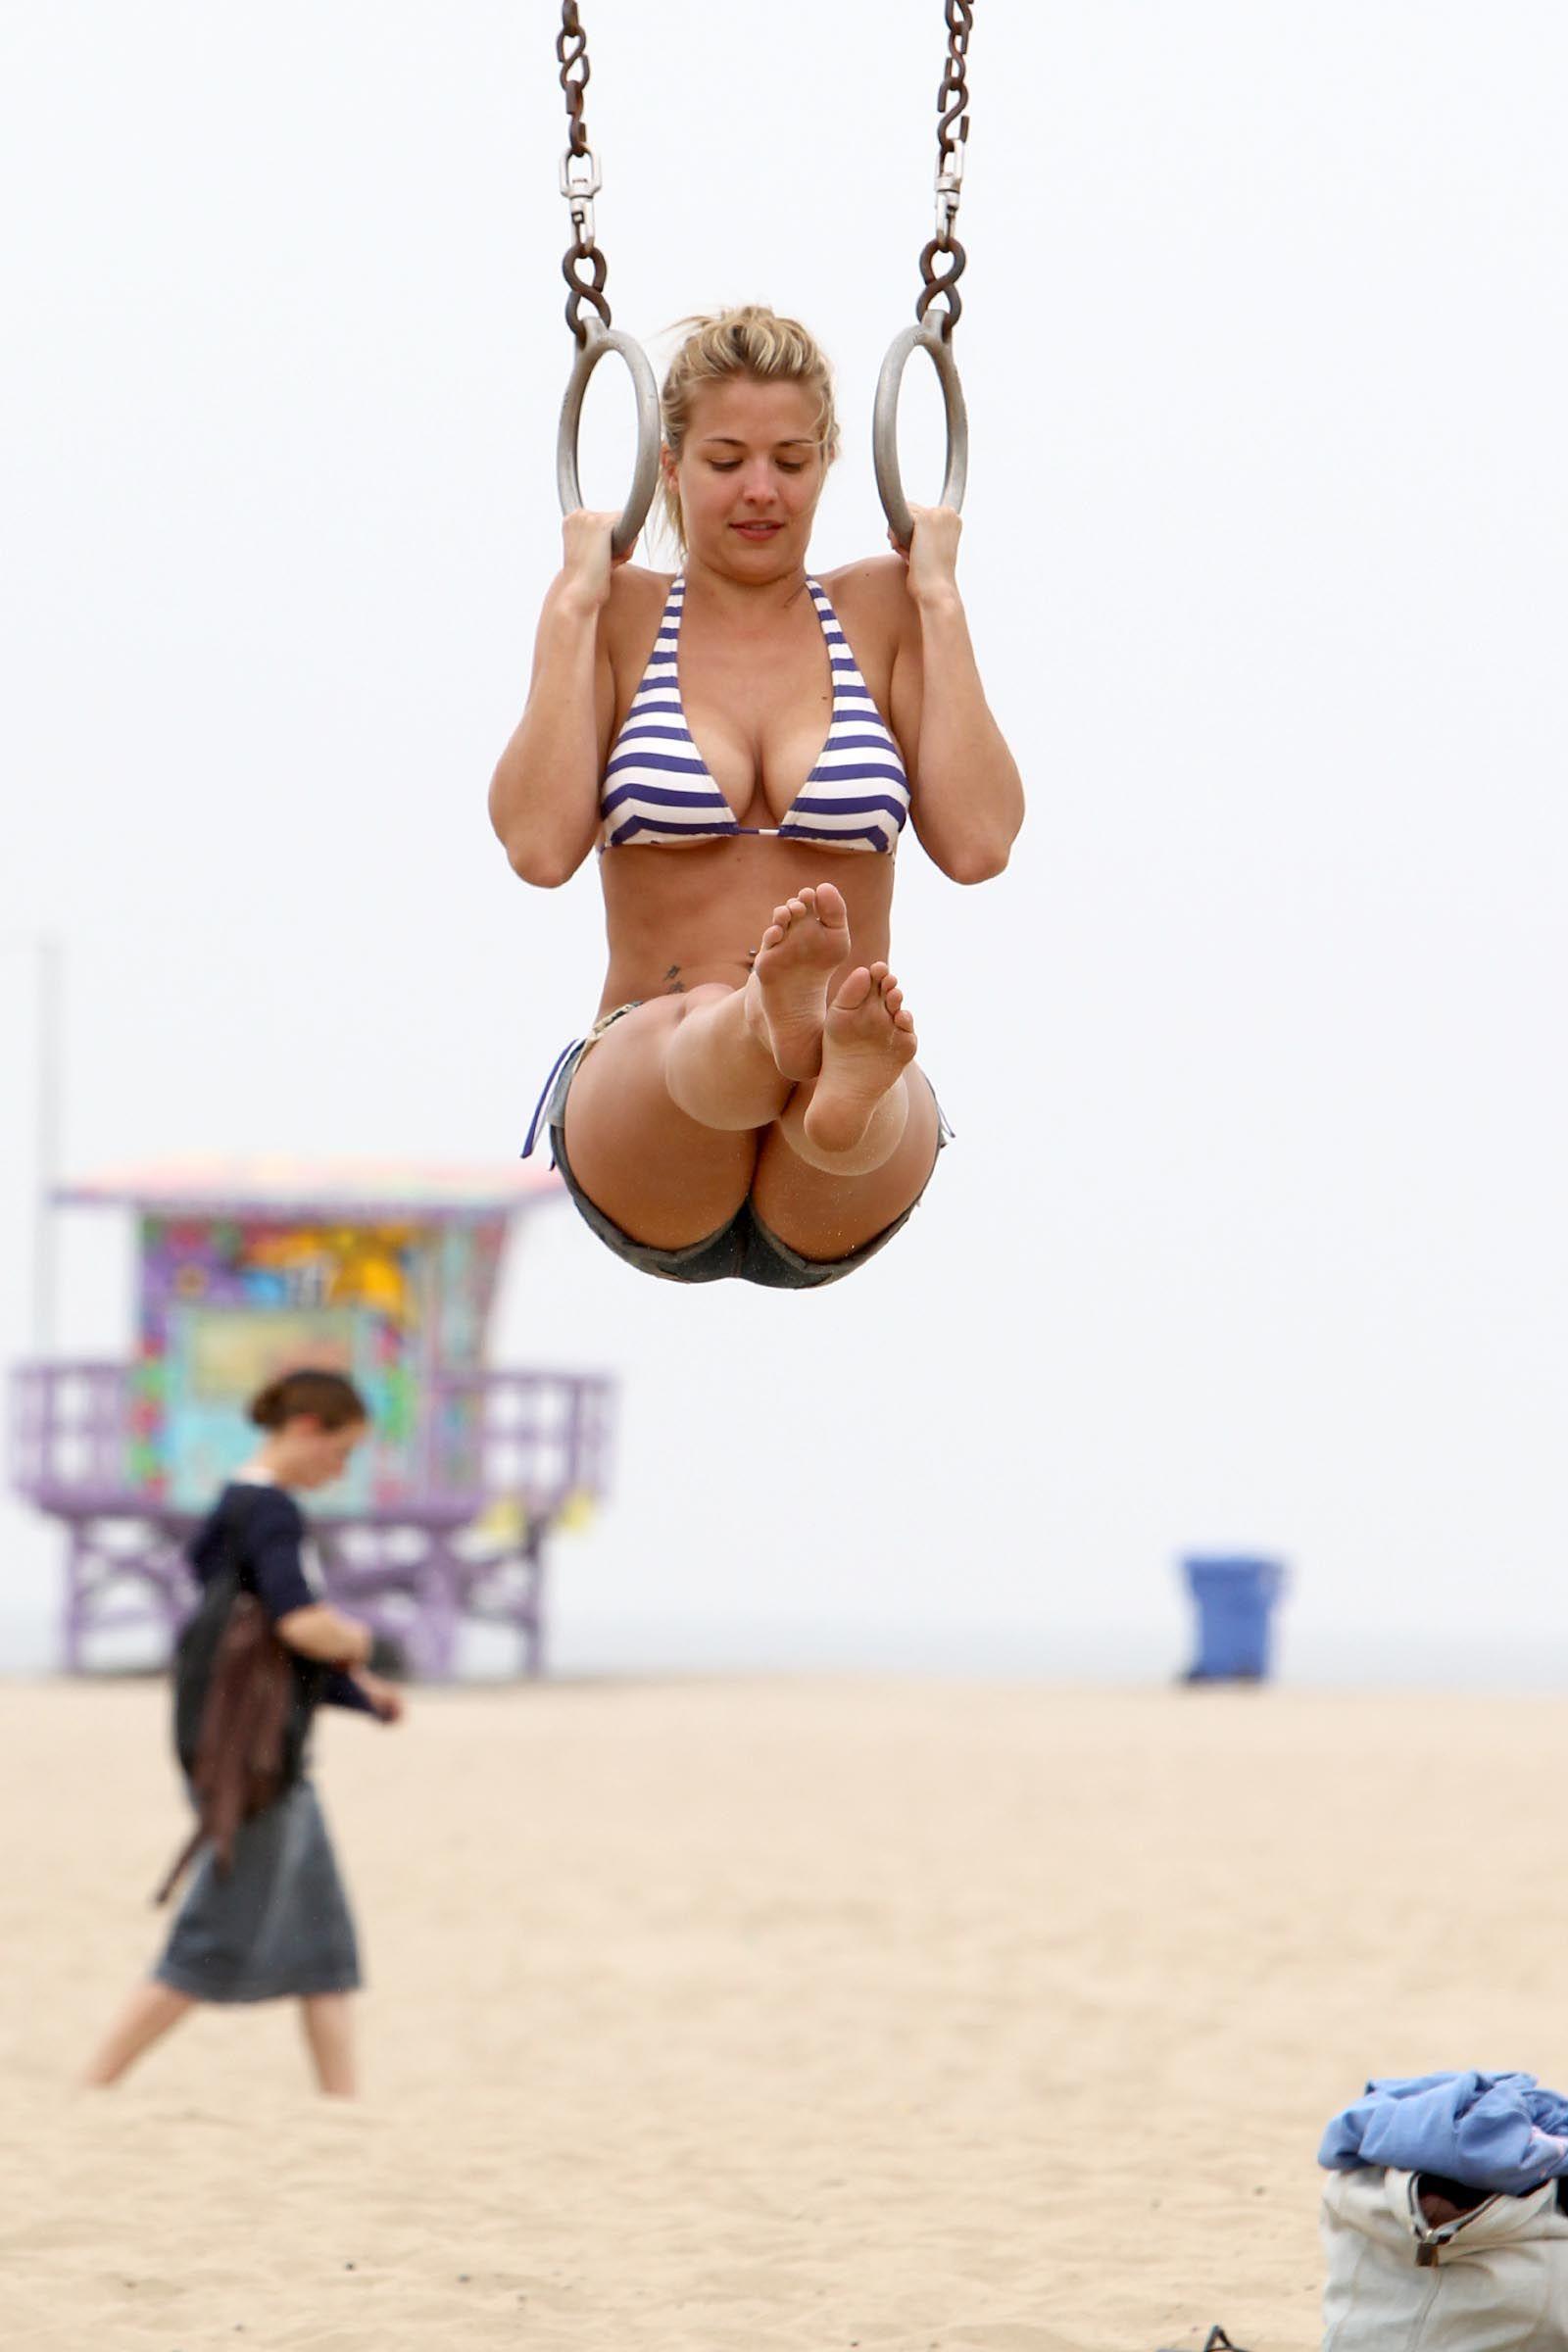 Consider, gemma atkinson striped bikini idea congratulate